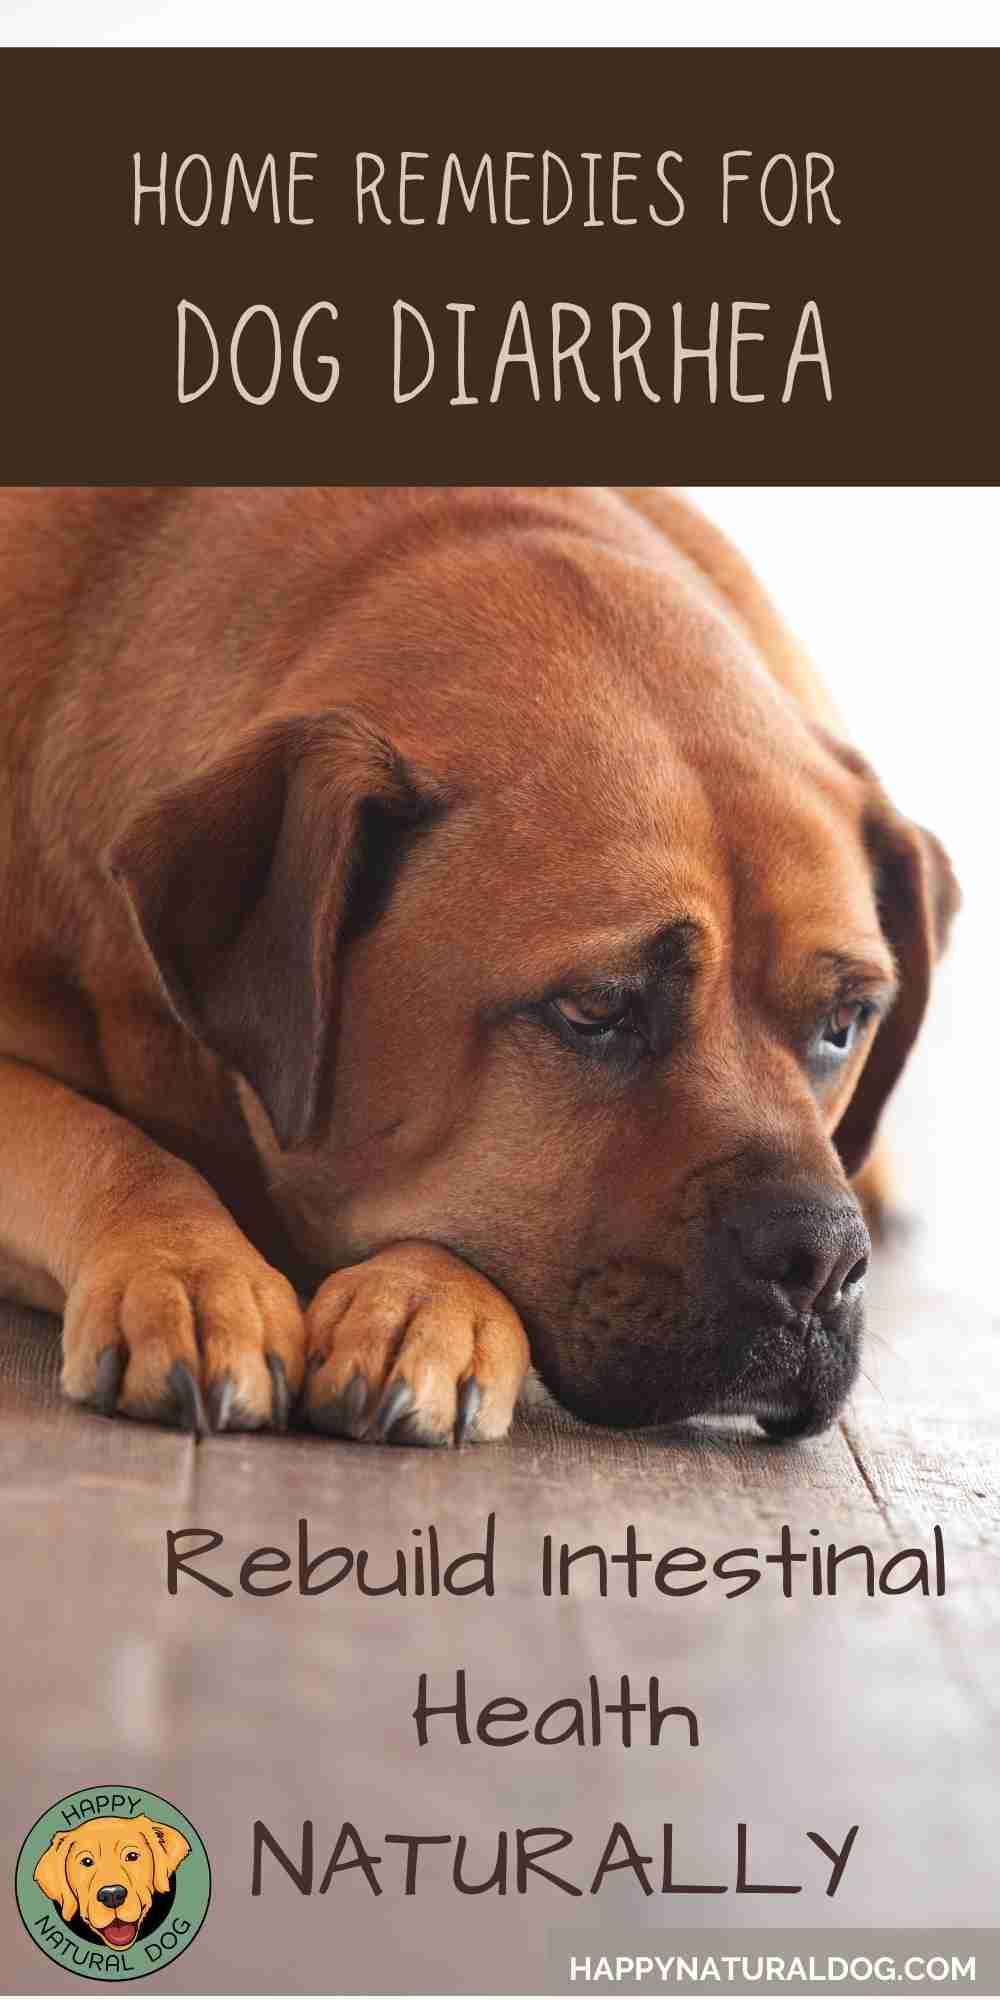 Home Remedies For Dog Diarrhea